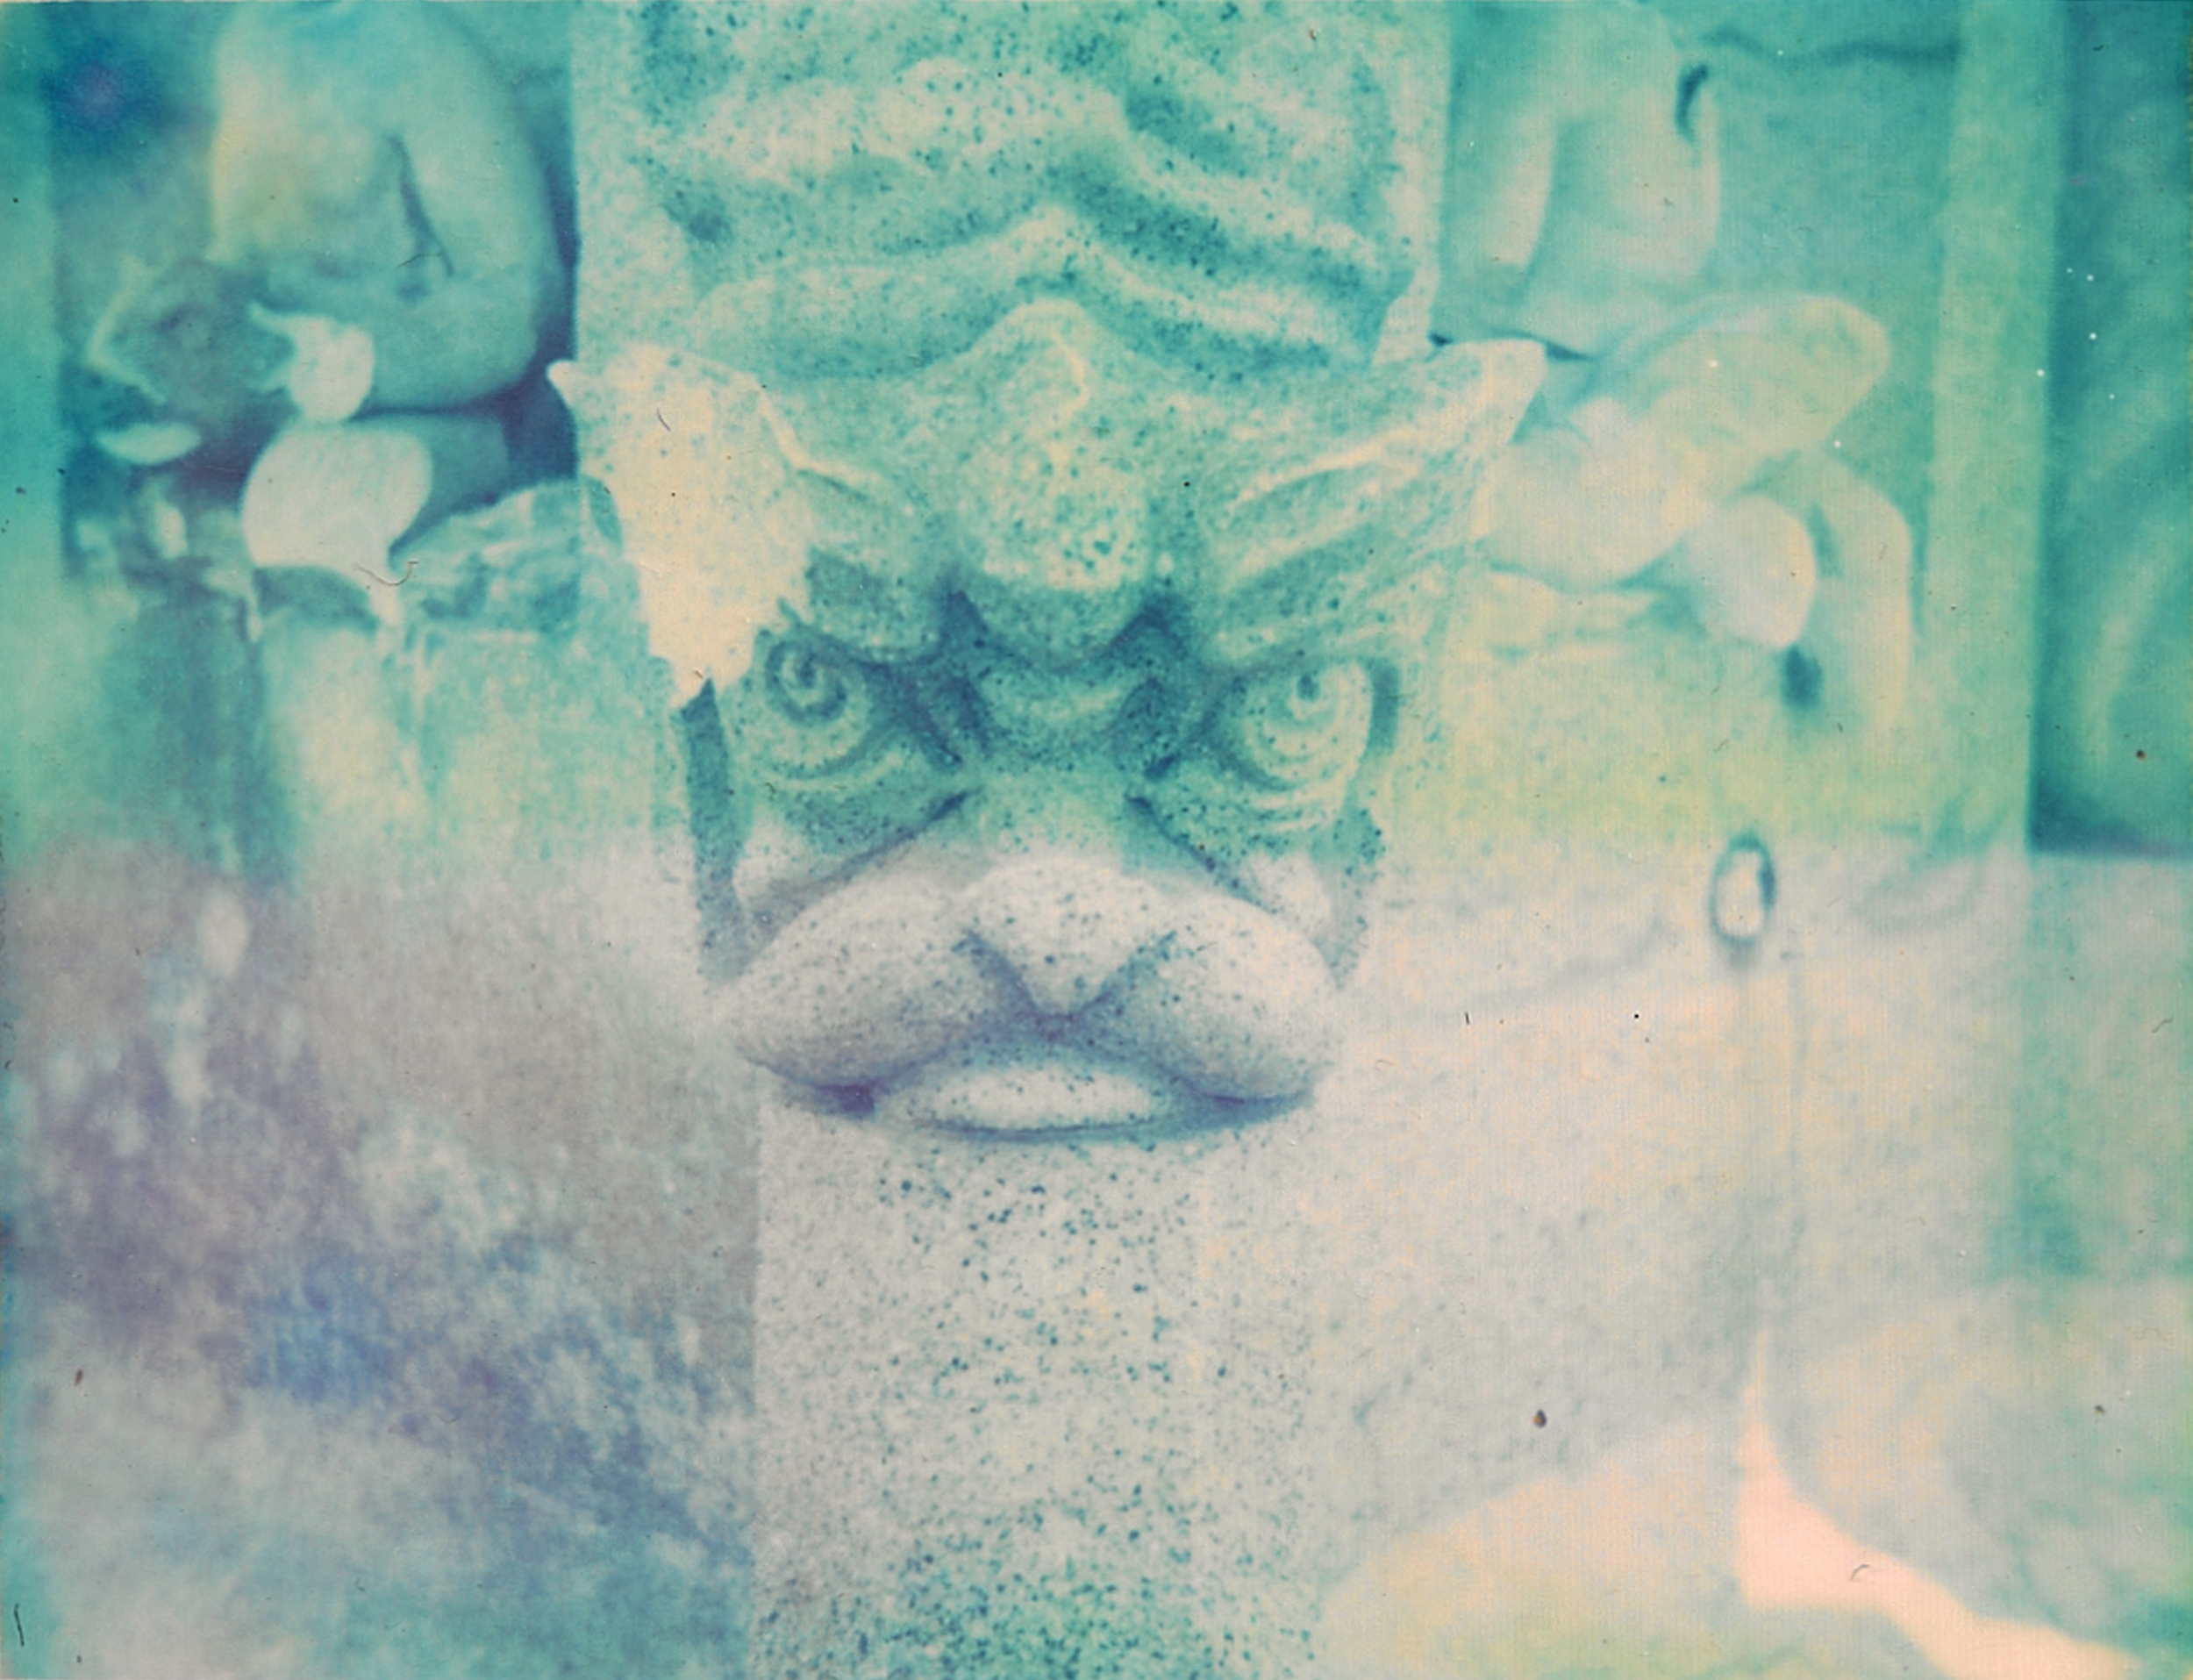 Fountain Monster cropped.jpg